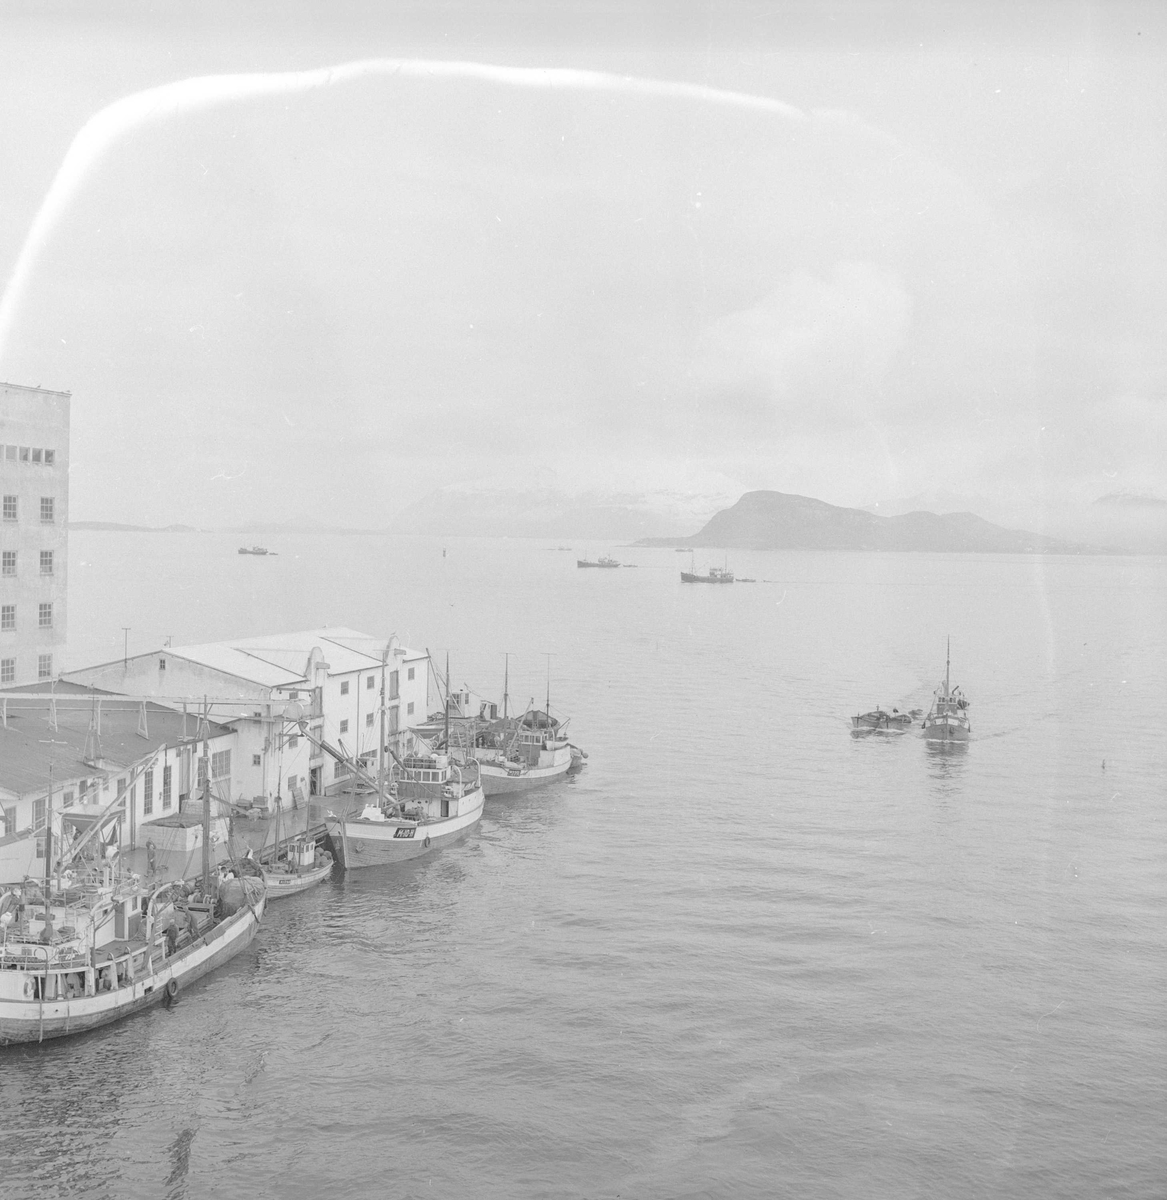 Ålesund, april 1956, sildefiske, fiskeskøyter langs kaia.